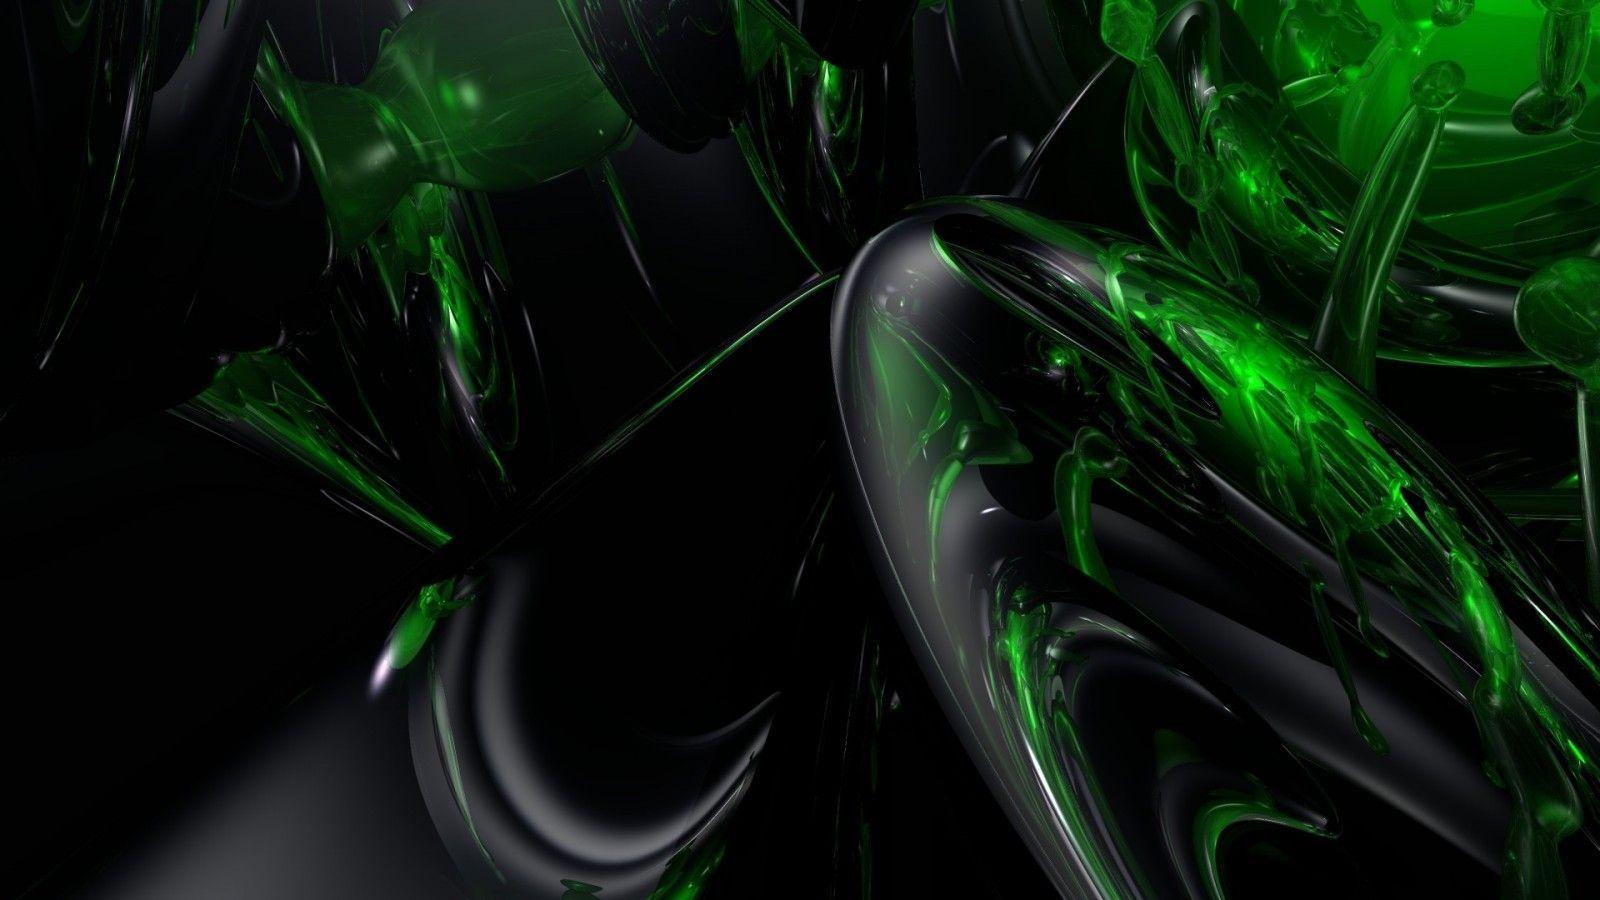 Wallpaper Black Green - Dark Wallpaper Windows Green 10 Hd - HD Wallpaper